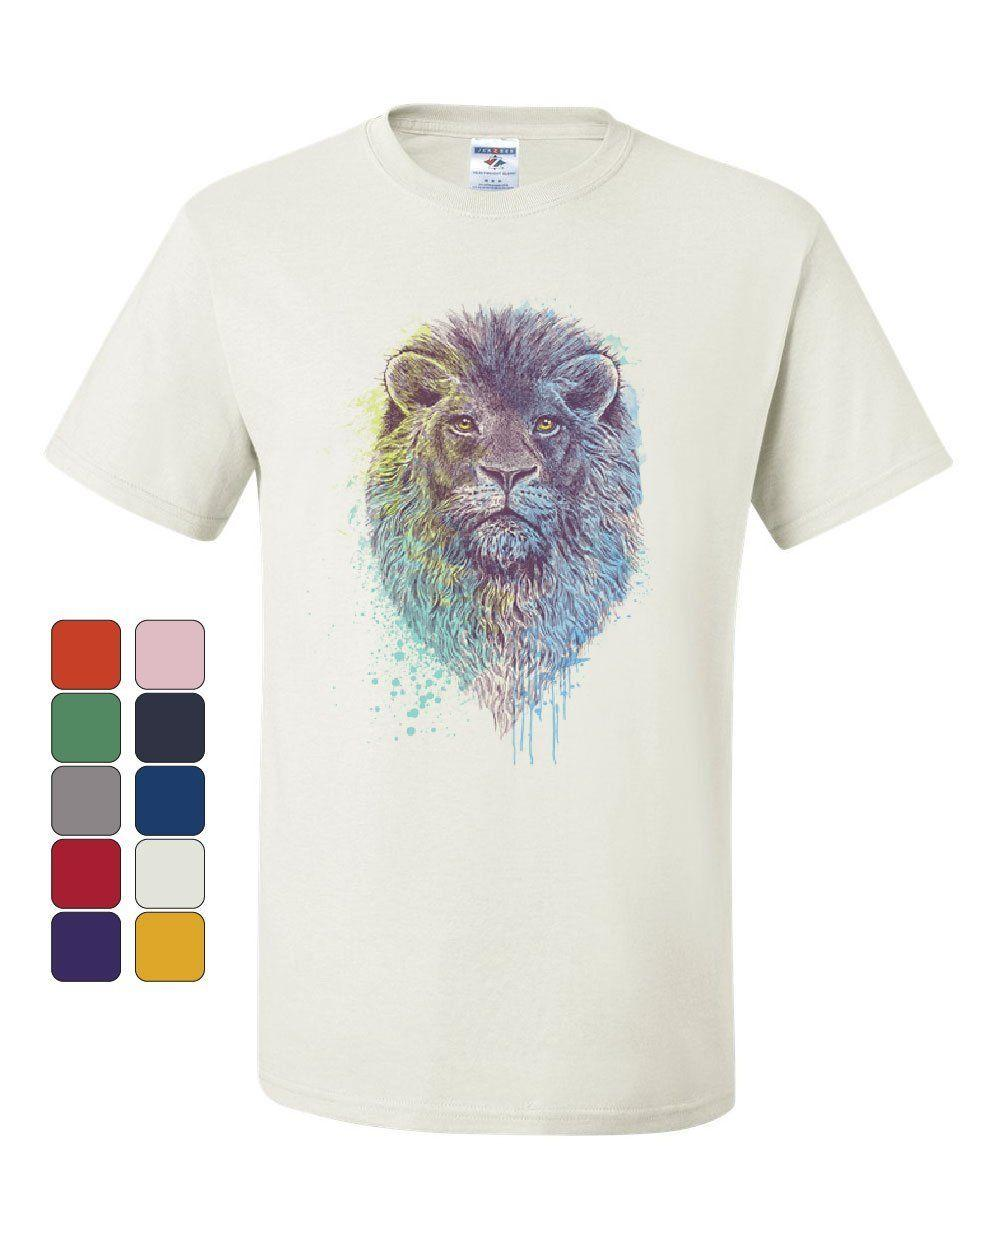 06636b03 Lion Head King Of The Jungle T Shirt Wildlife Animal Roar Safari Tee  ShirtFunny Unisex Casual Tshirt Top Cool Team Shirts Crazy Shirt Designs  From ...